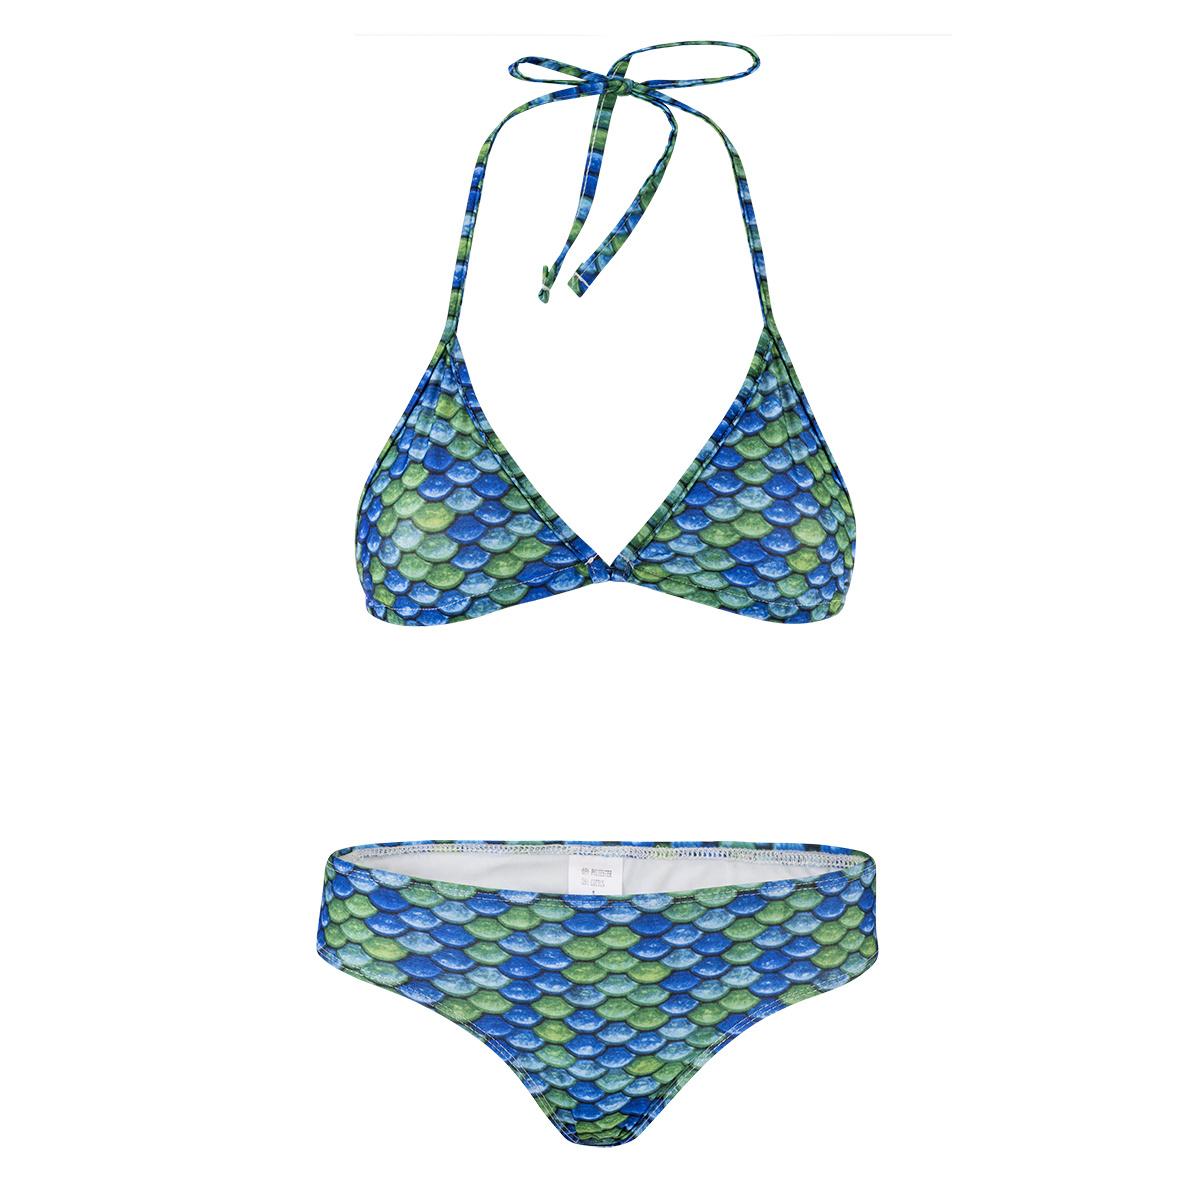 NoordZeemeermin Bikini Greeny triangle taille L (158164)